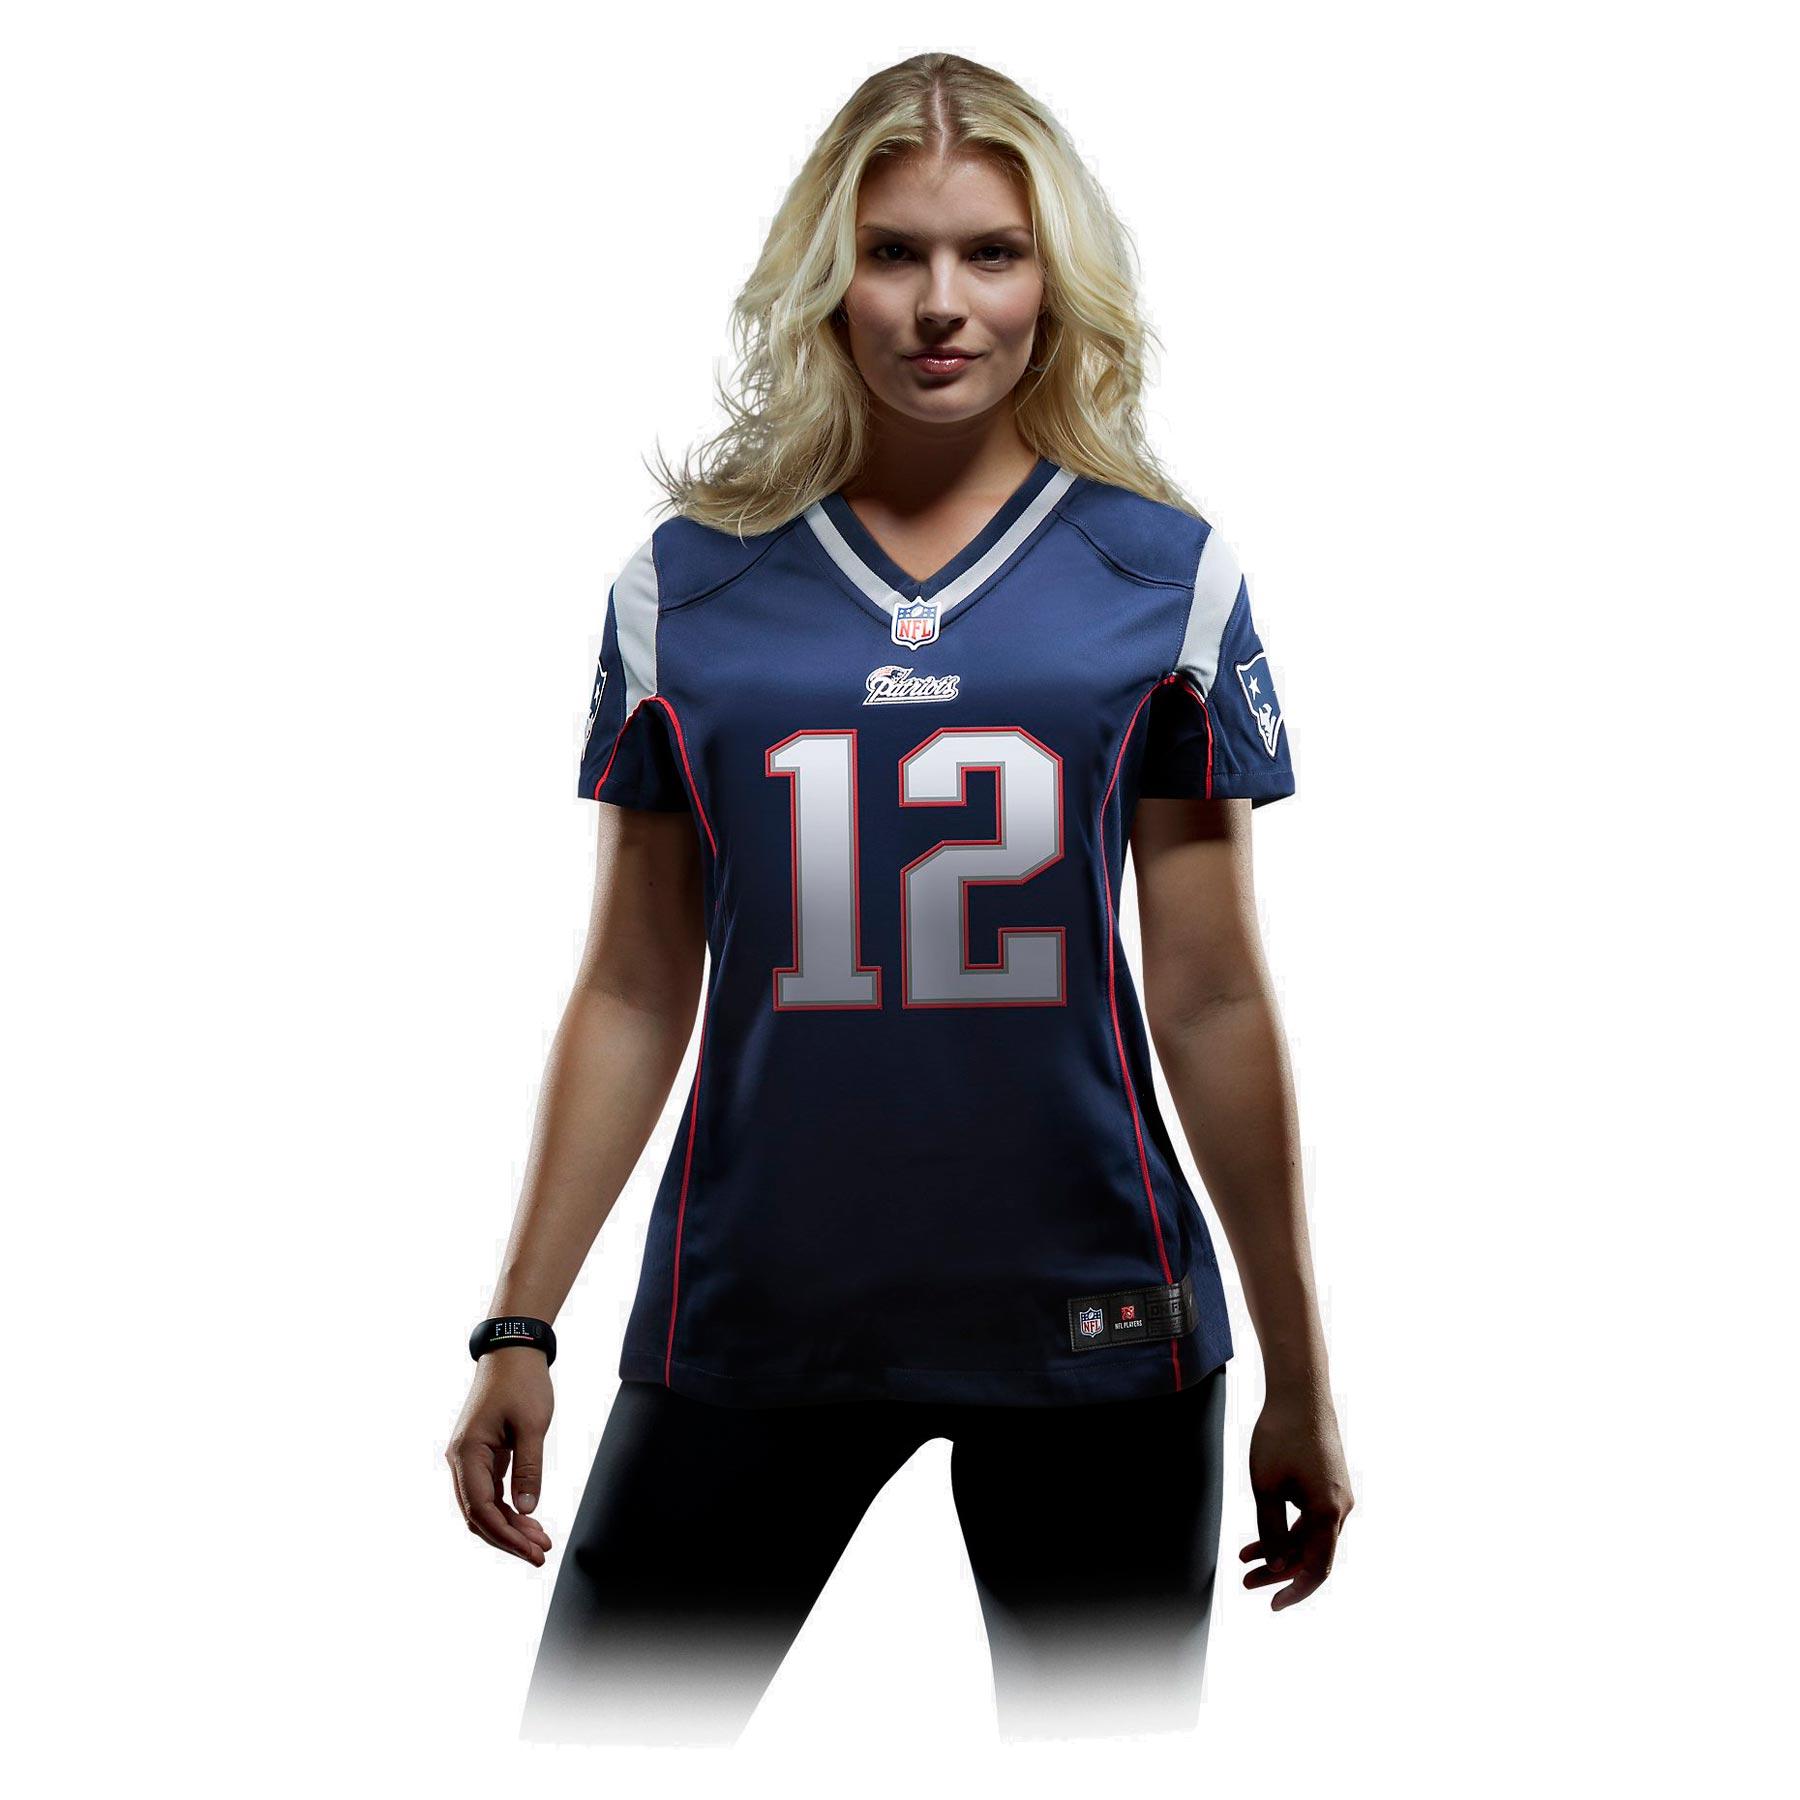 womens nfl jerseys cheap, OFF 78%,Buy!